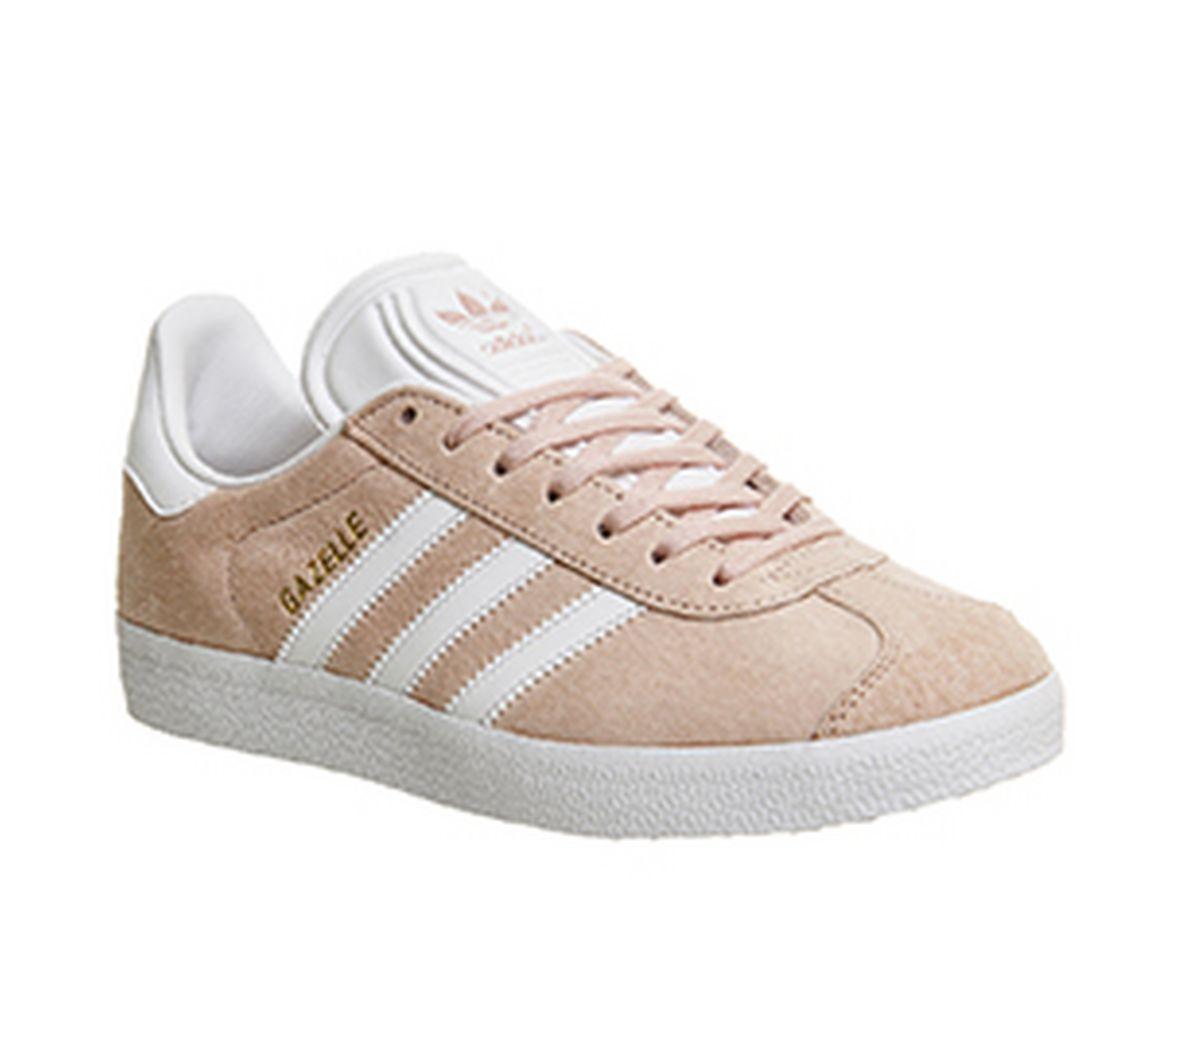 7a237b473d8 adidas Gazelle Vapour Pink White - His trainers